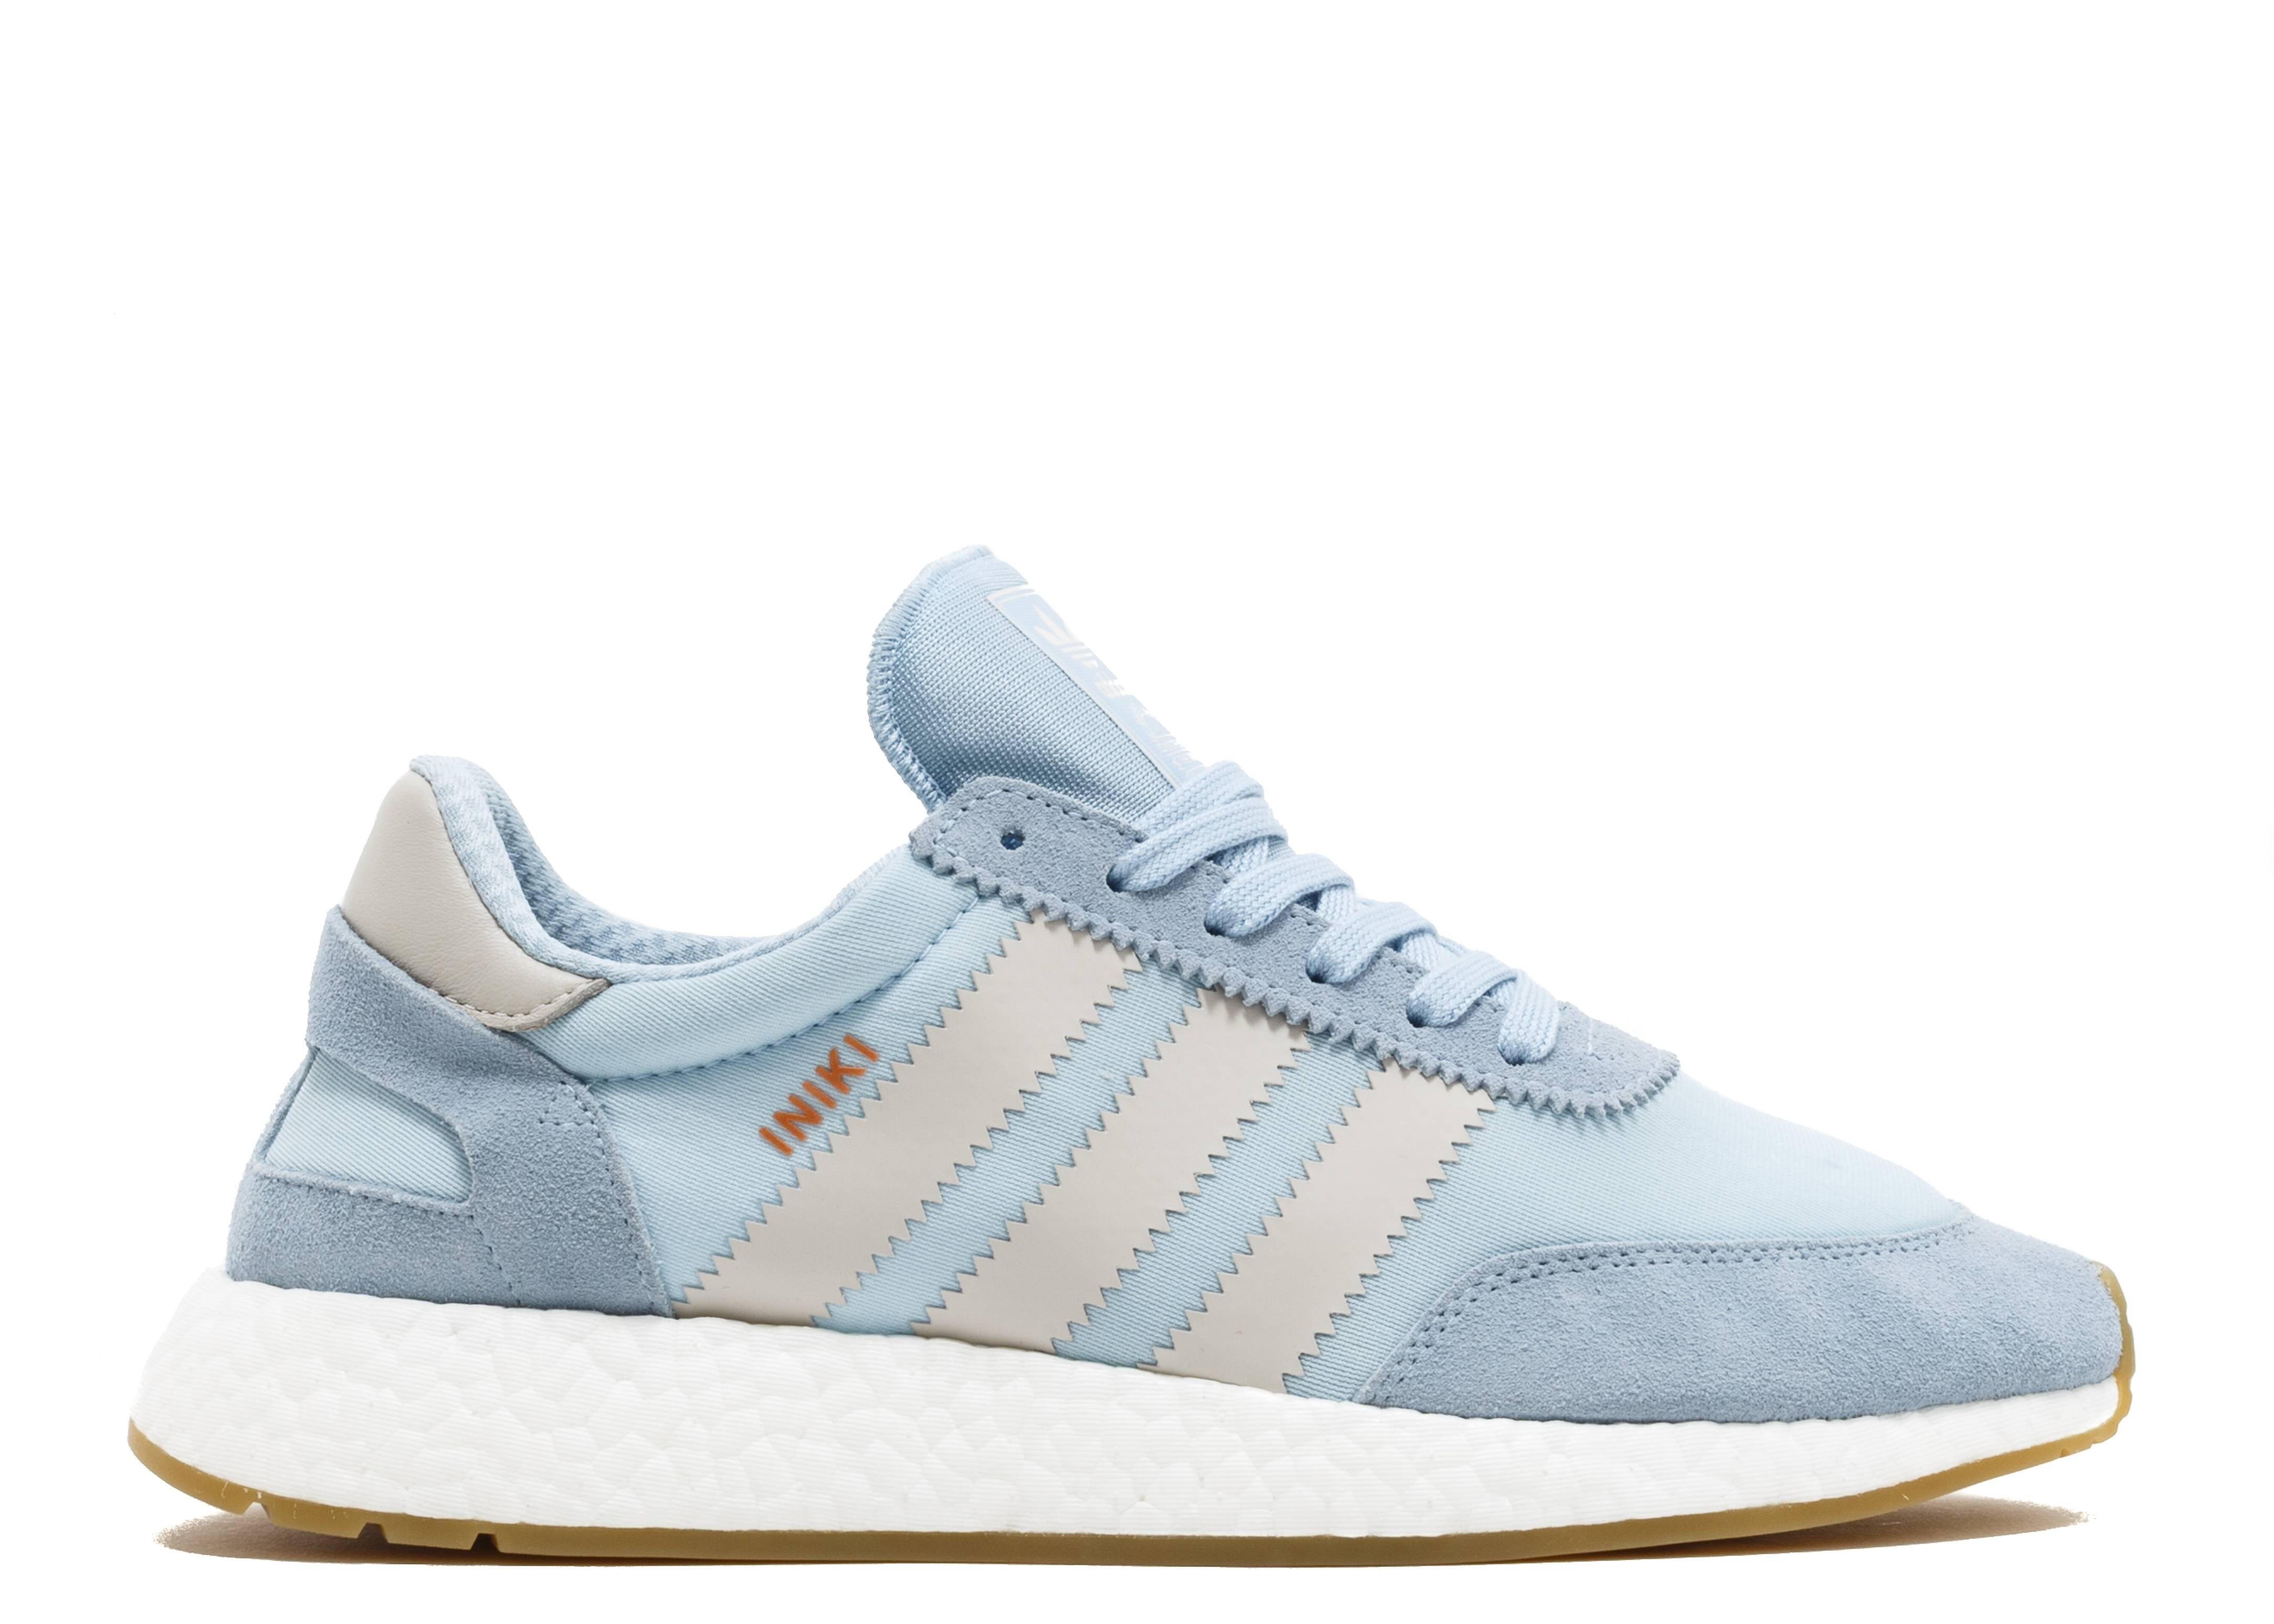 iniki runner adidas bb2099 polvere blu / bianco volo club